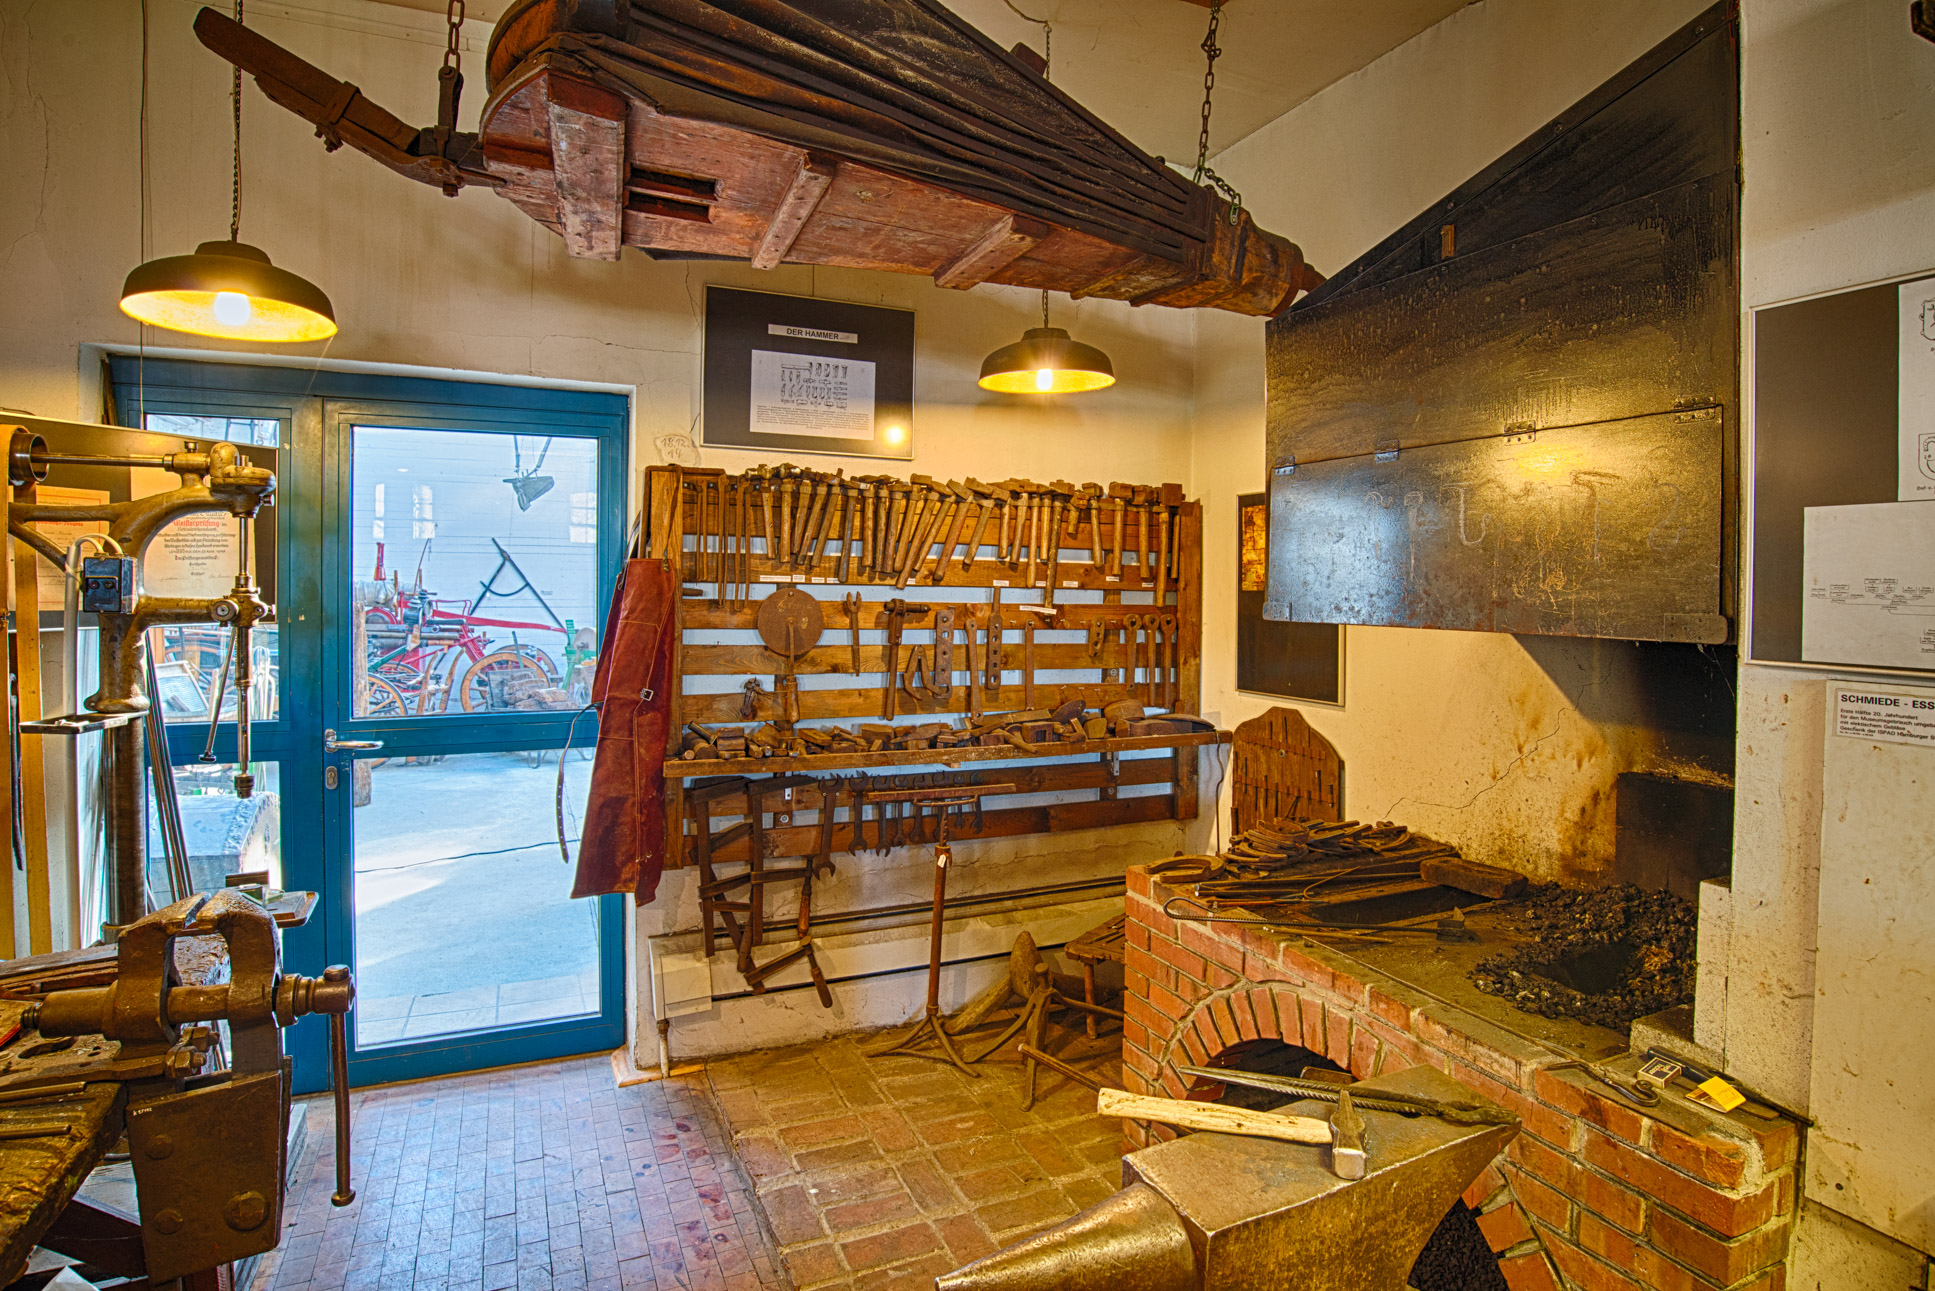 Handwerksmuseum-Horneburg-Rundgang2018-2844_HDR-16